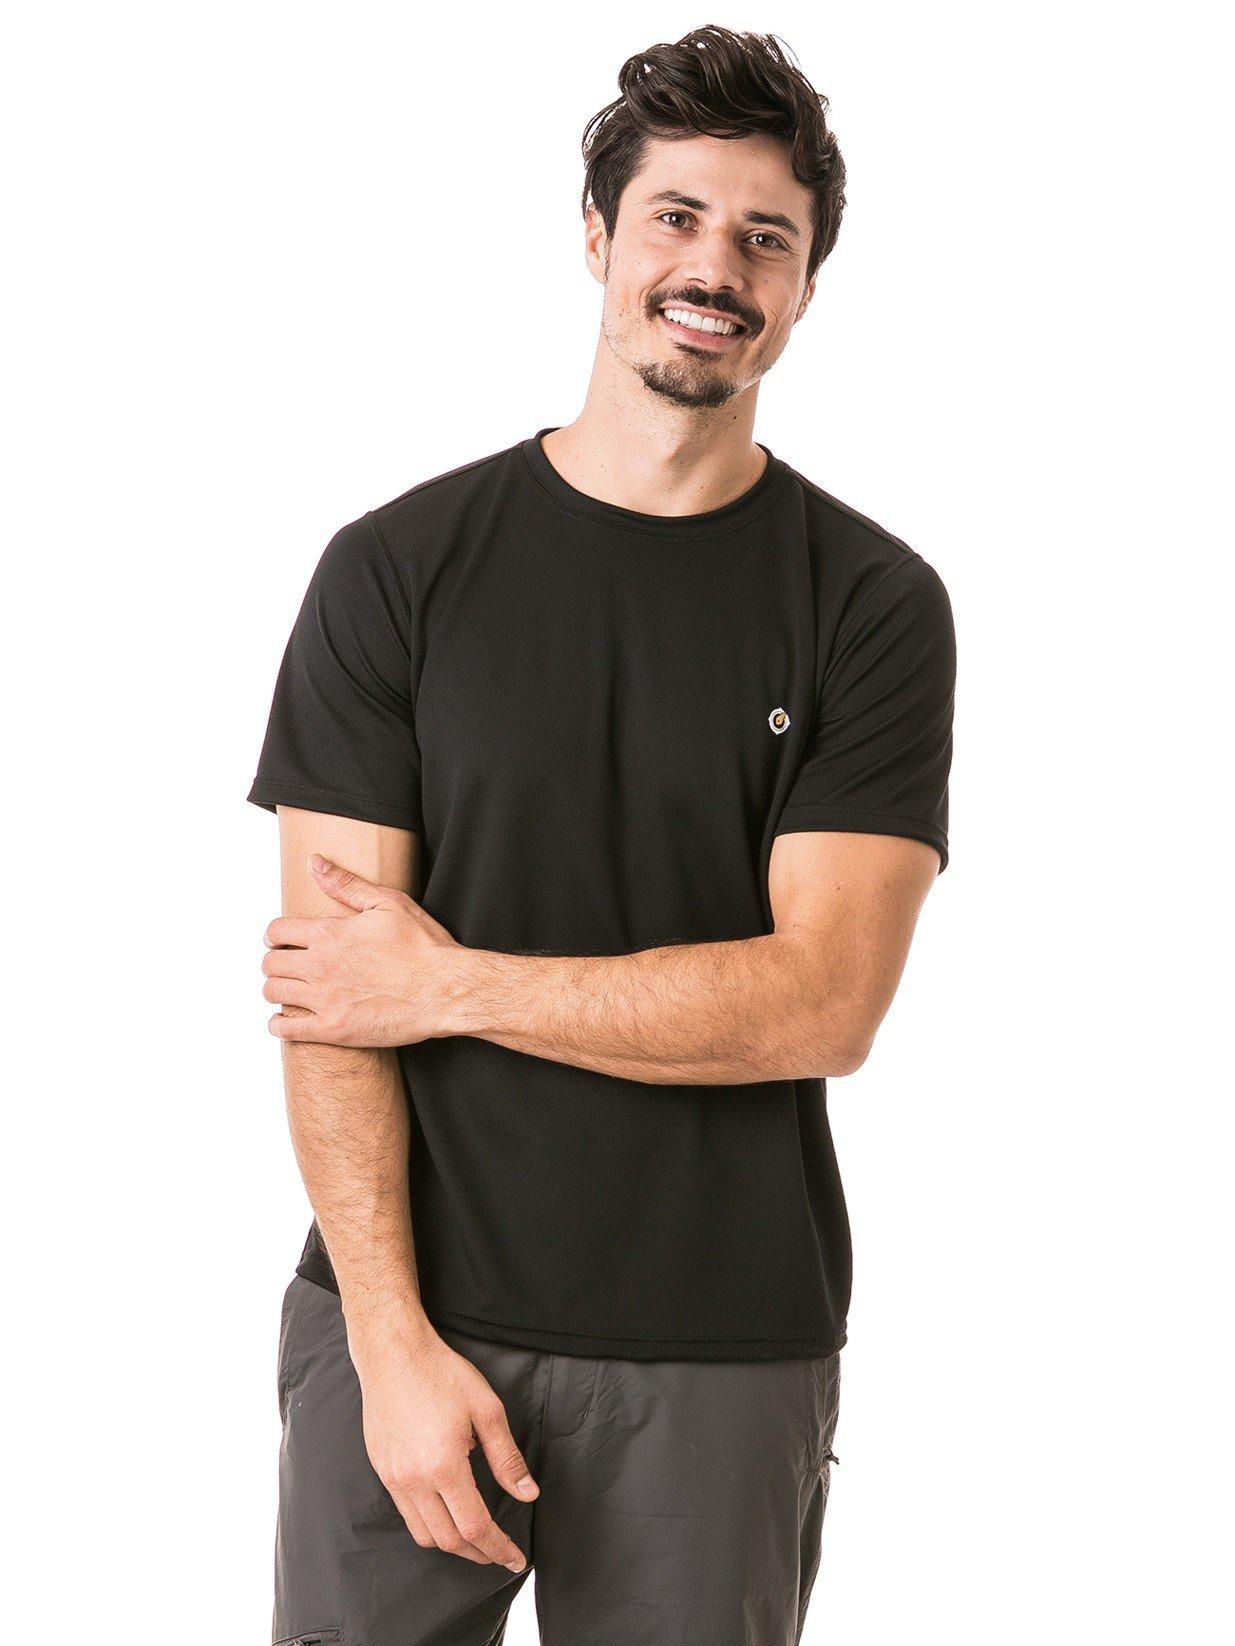 masculina t shirt curta dry preta frente b